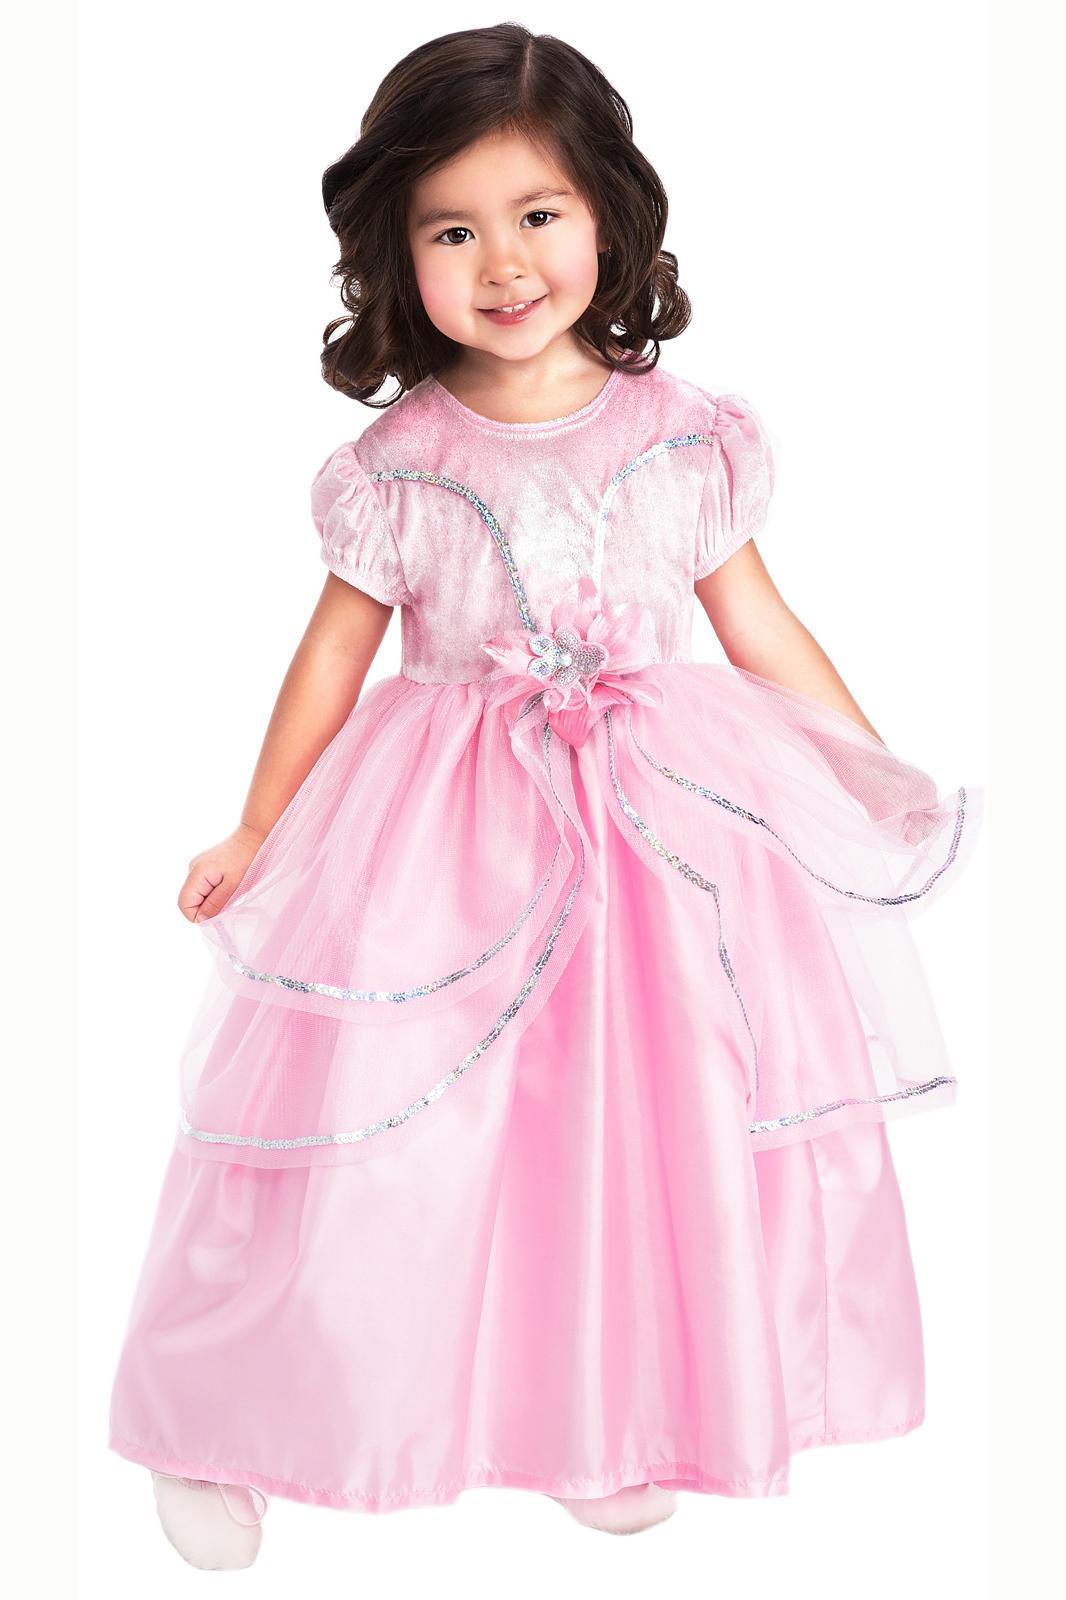 Royal Pink Ballgown Dress Up Costume